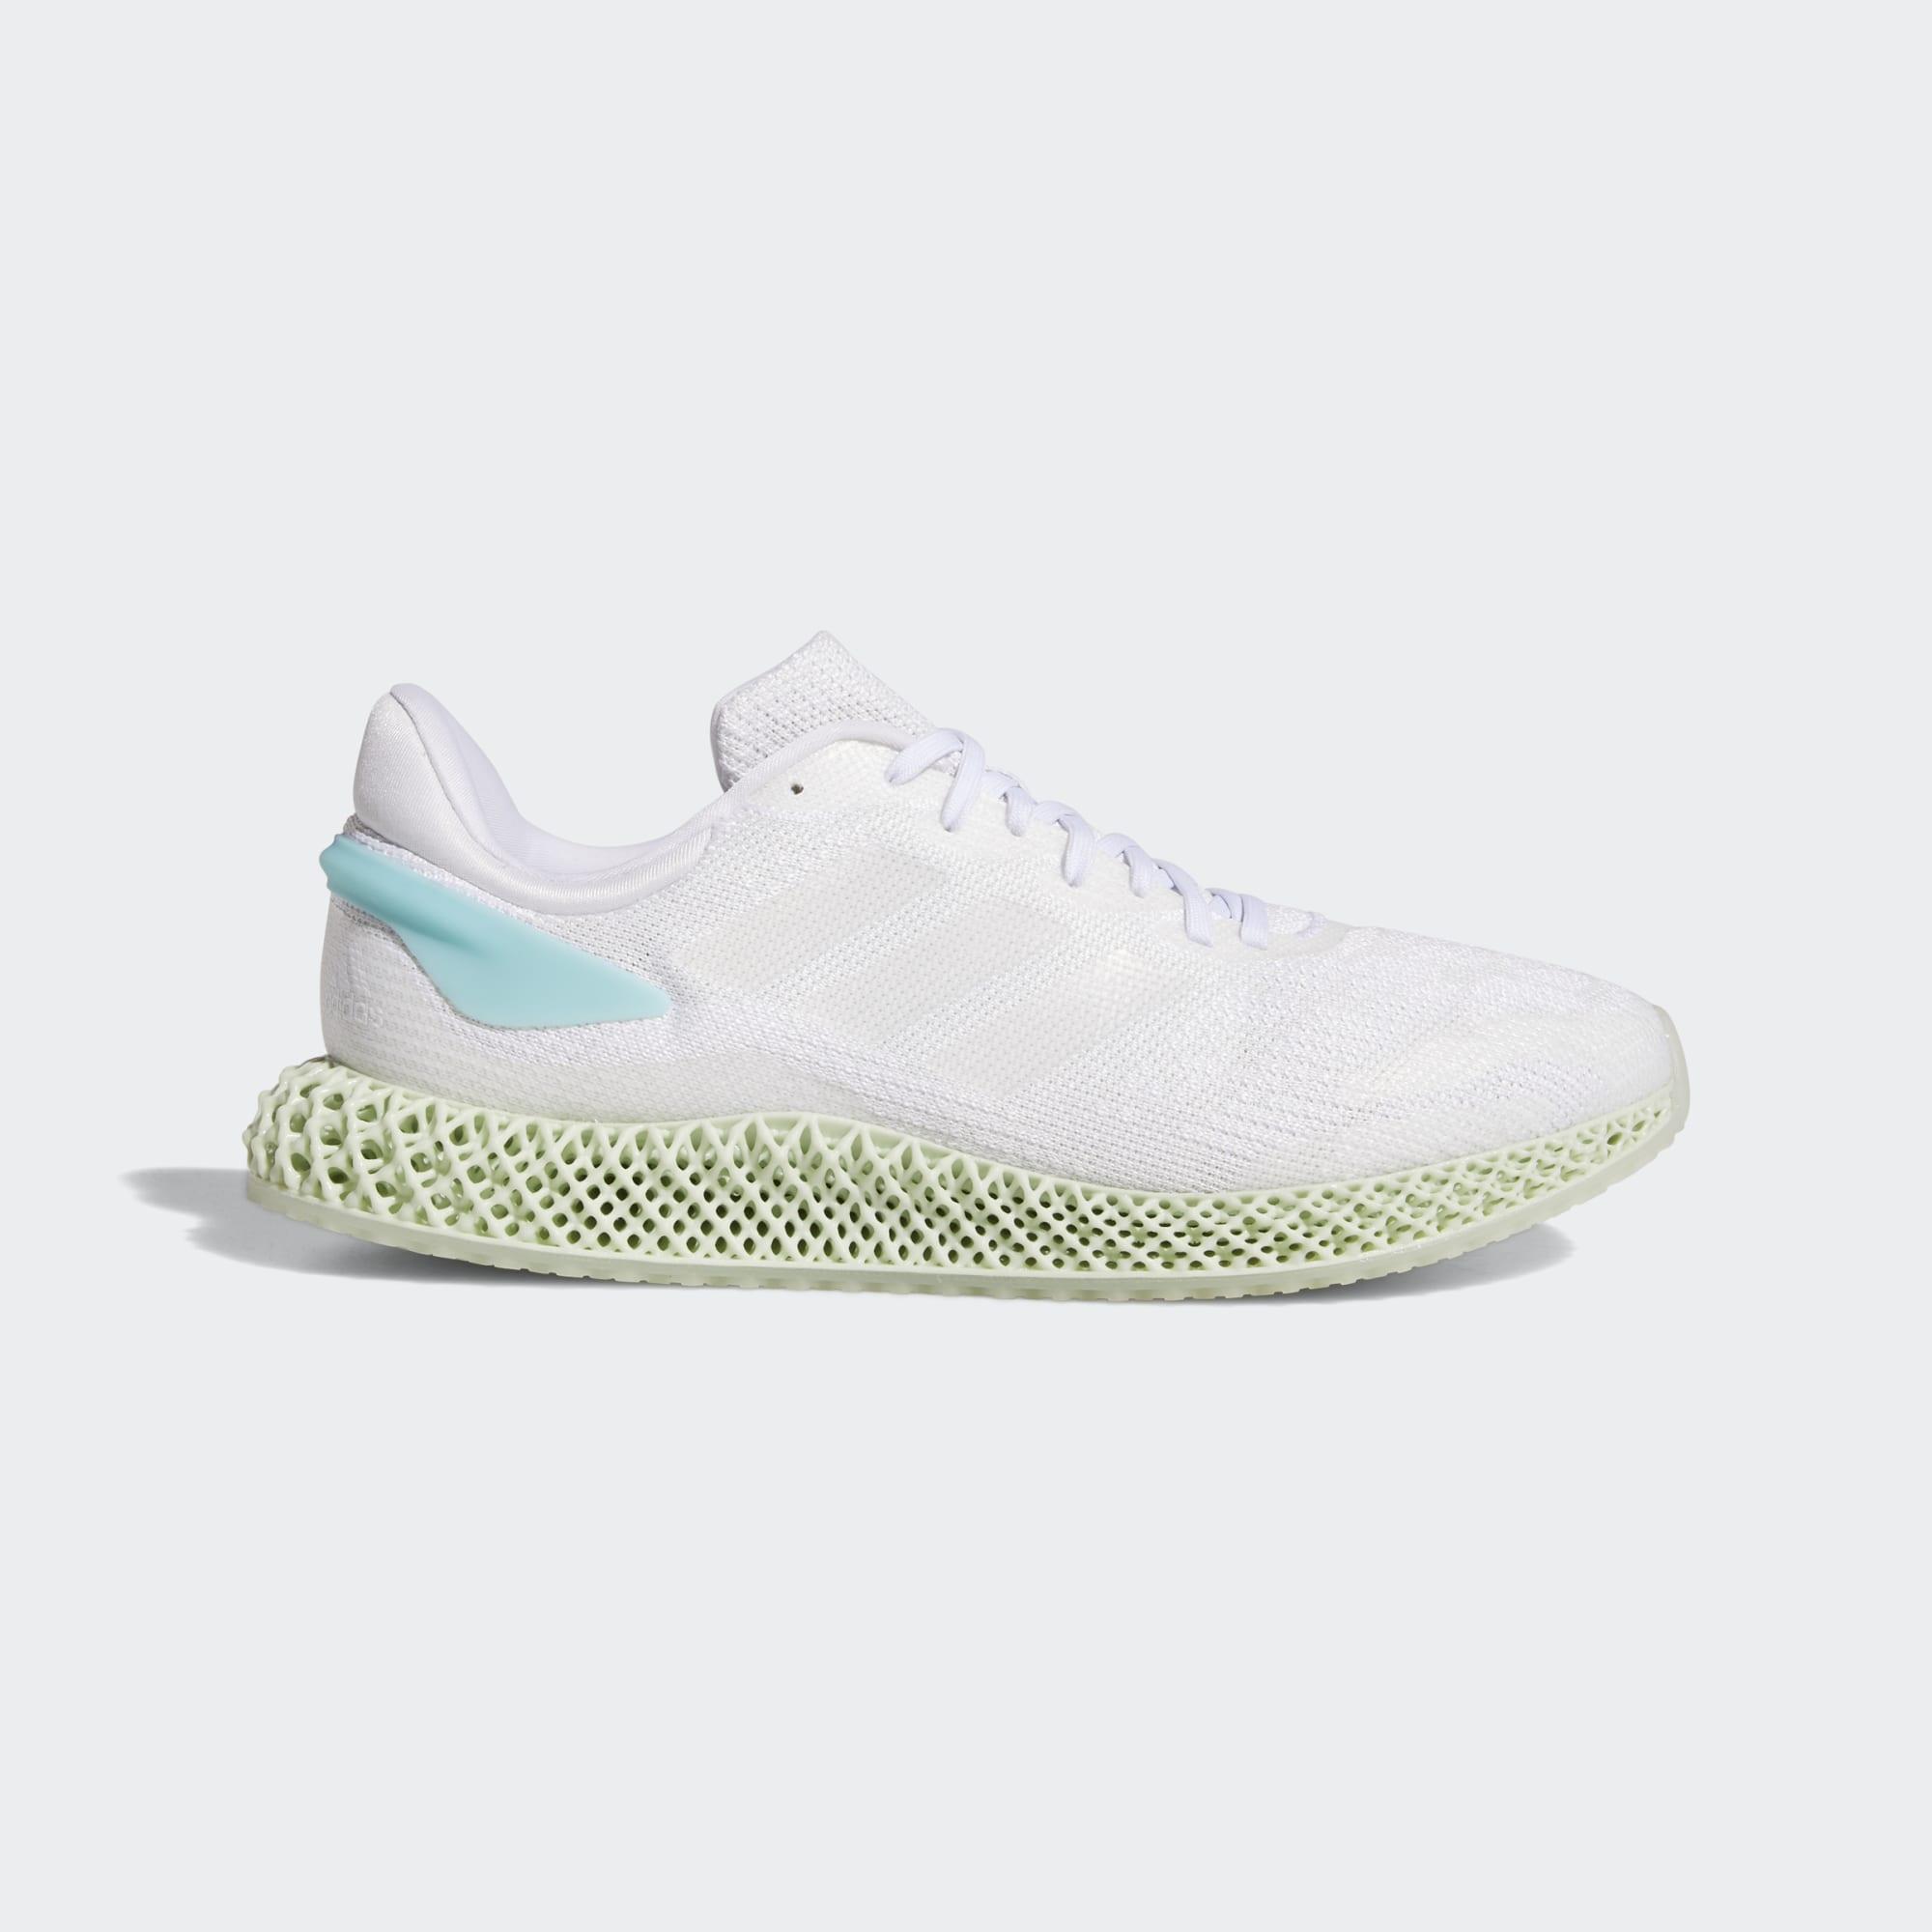 giay-sneaker-nam-adidas-4d-run-1-0-parley-fv5323-cloud-white-hang-chinh-hang